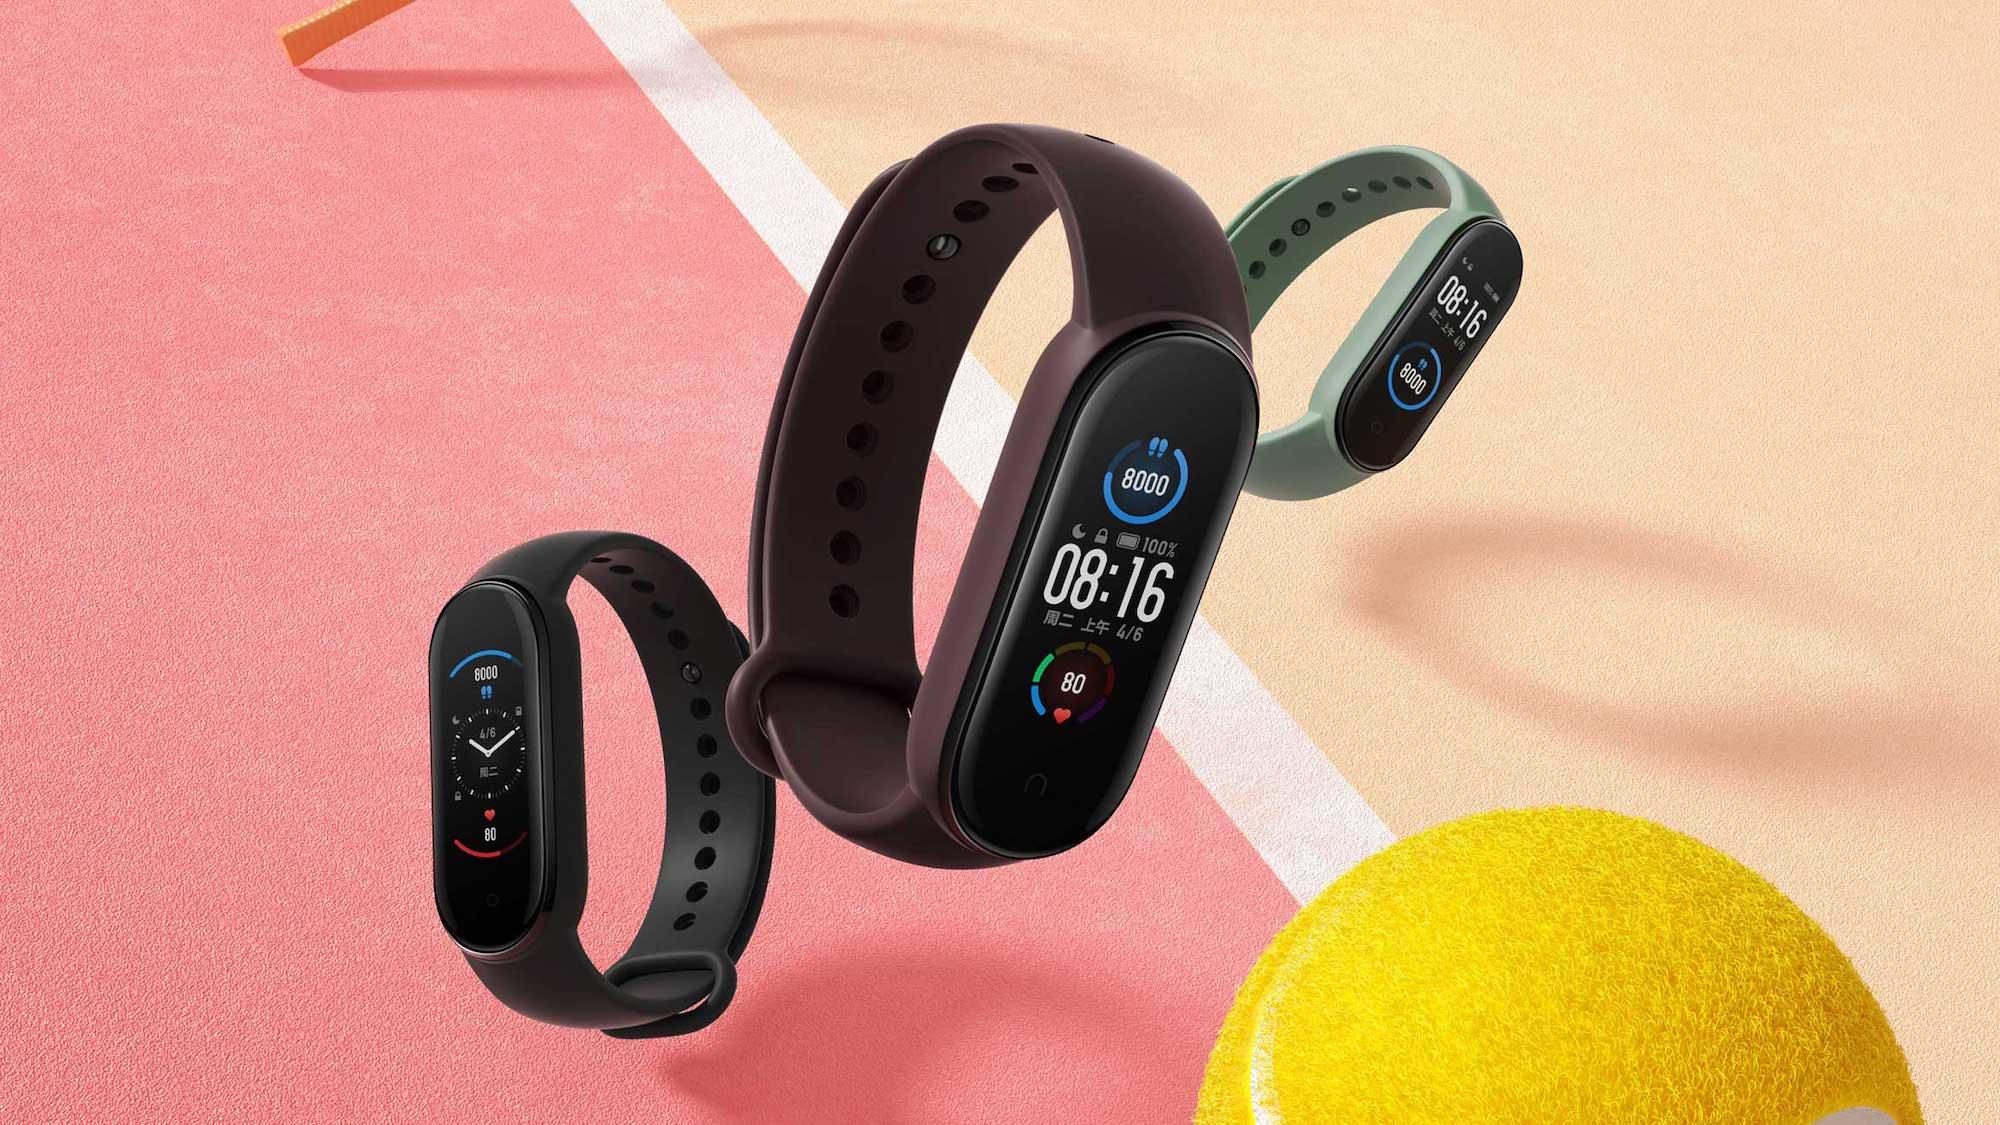 Xiaomi Mi Band 5 Fitness Tracker